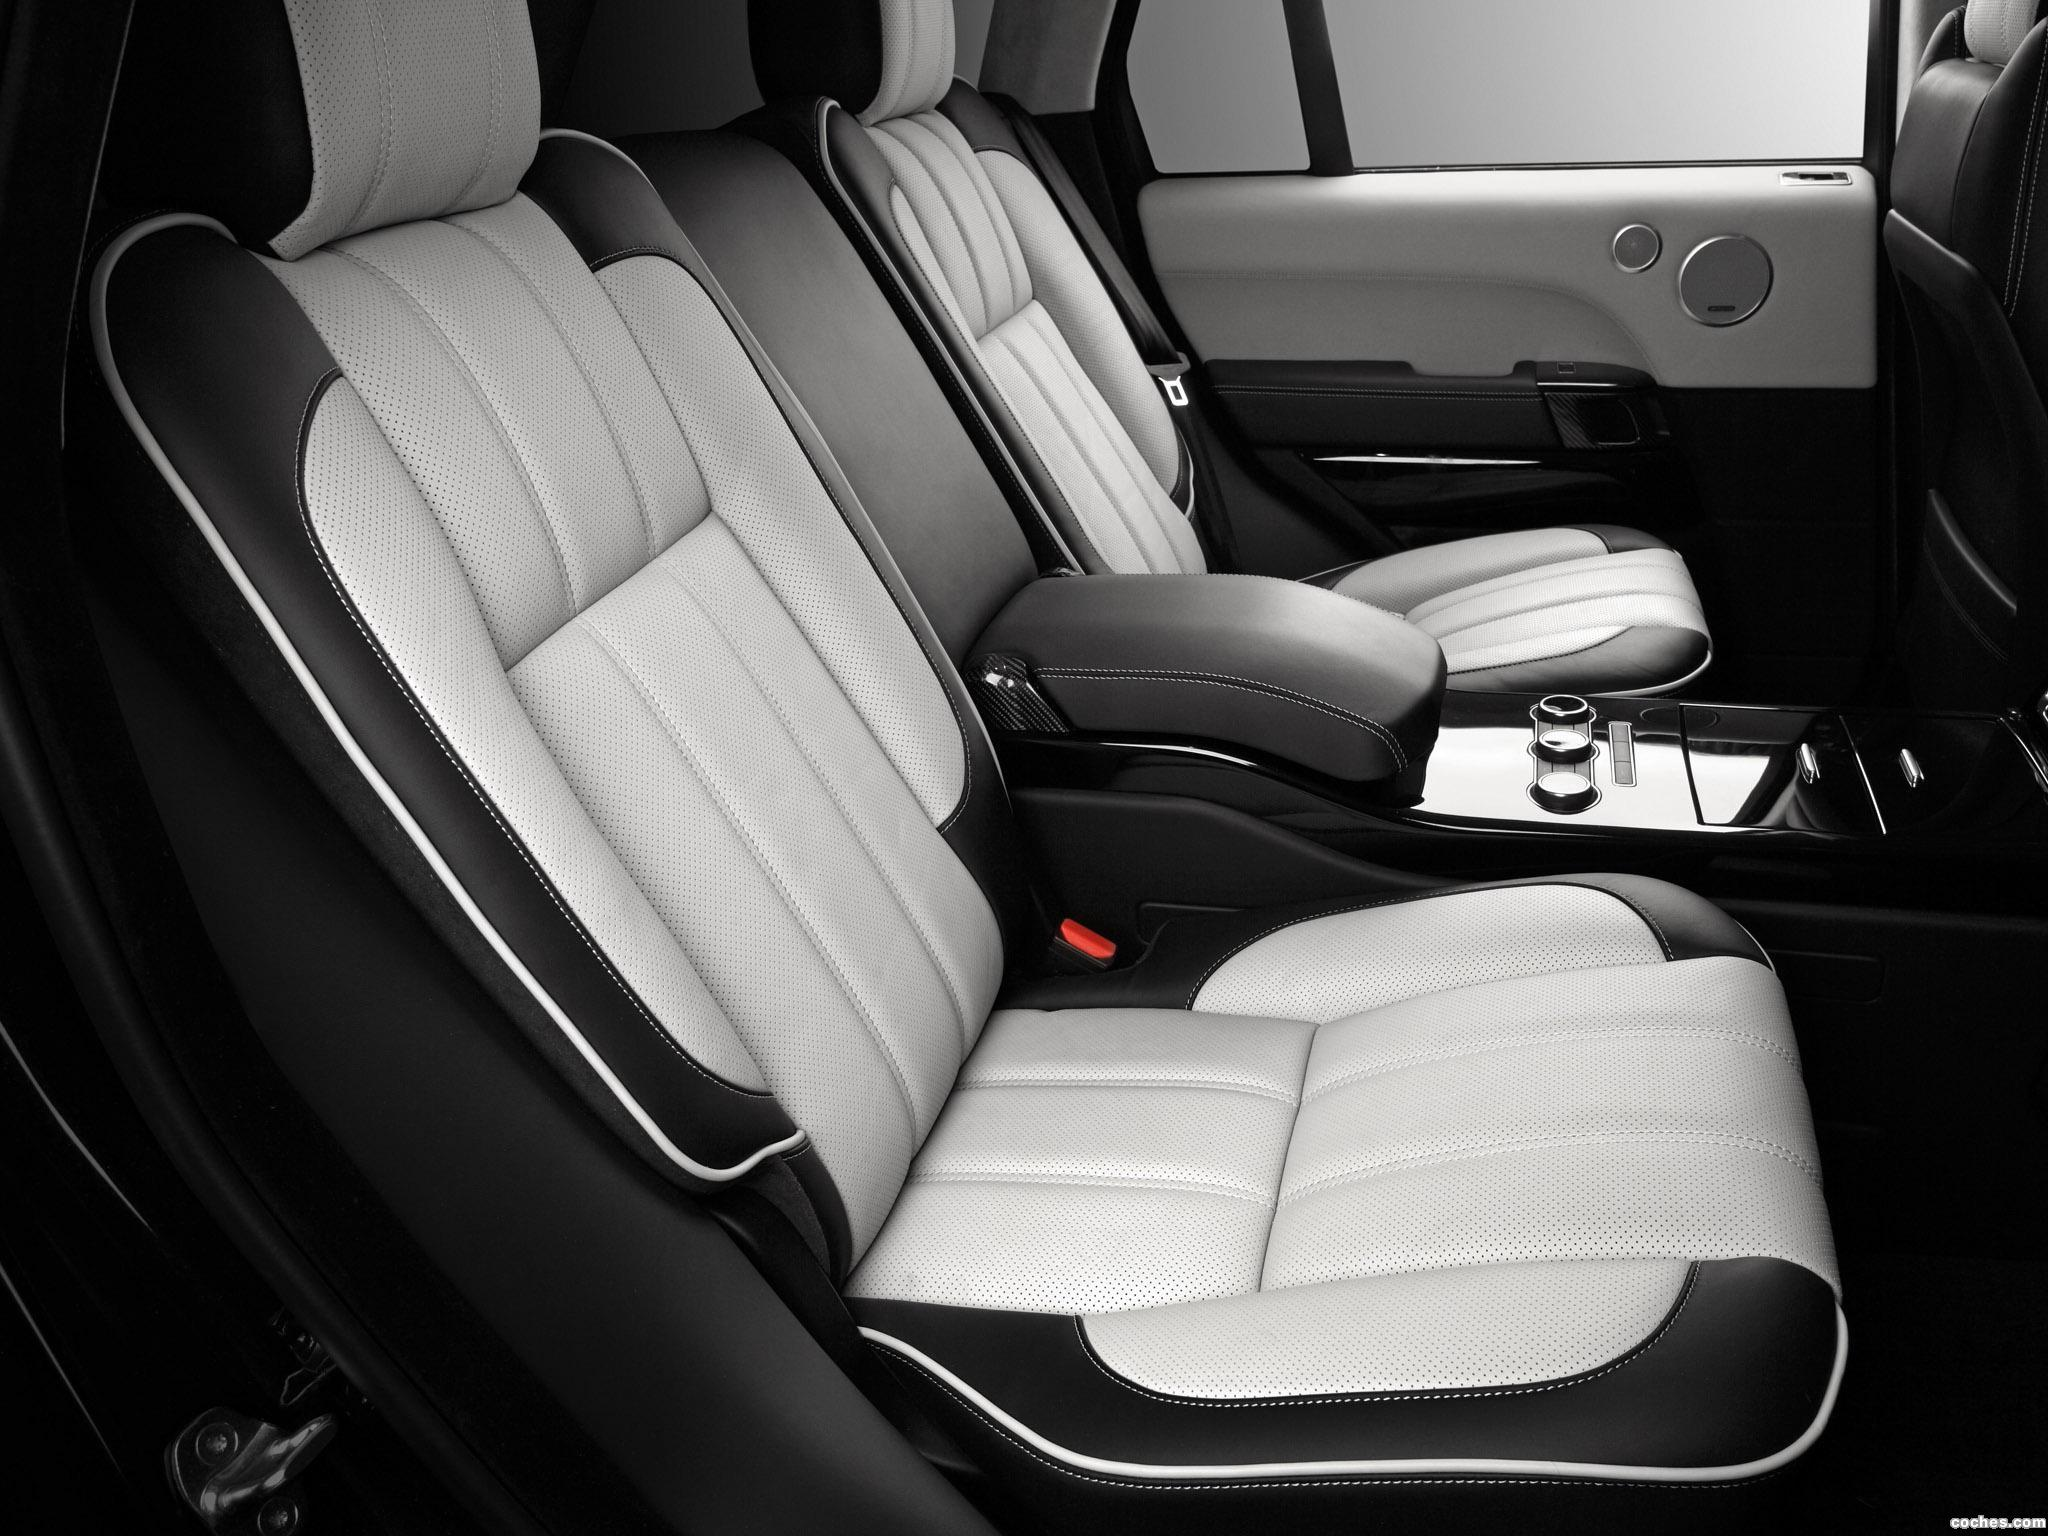 Foto 14 de Topcar Land Rover Range Rover Lumma CLR R L405 2013